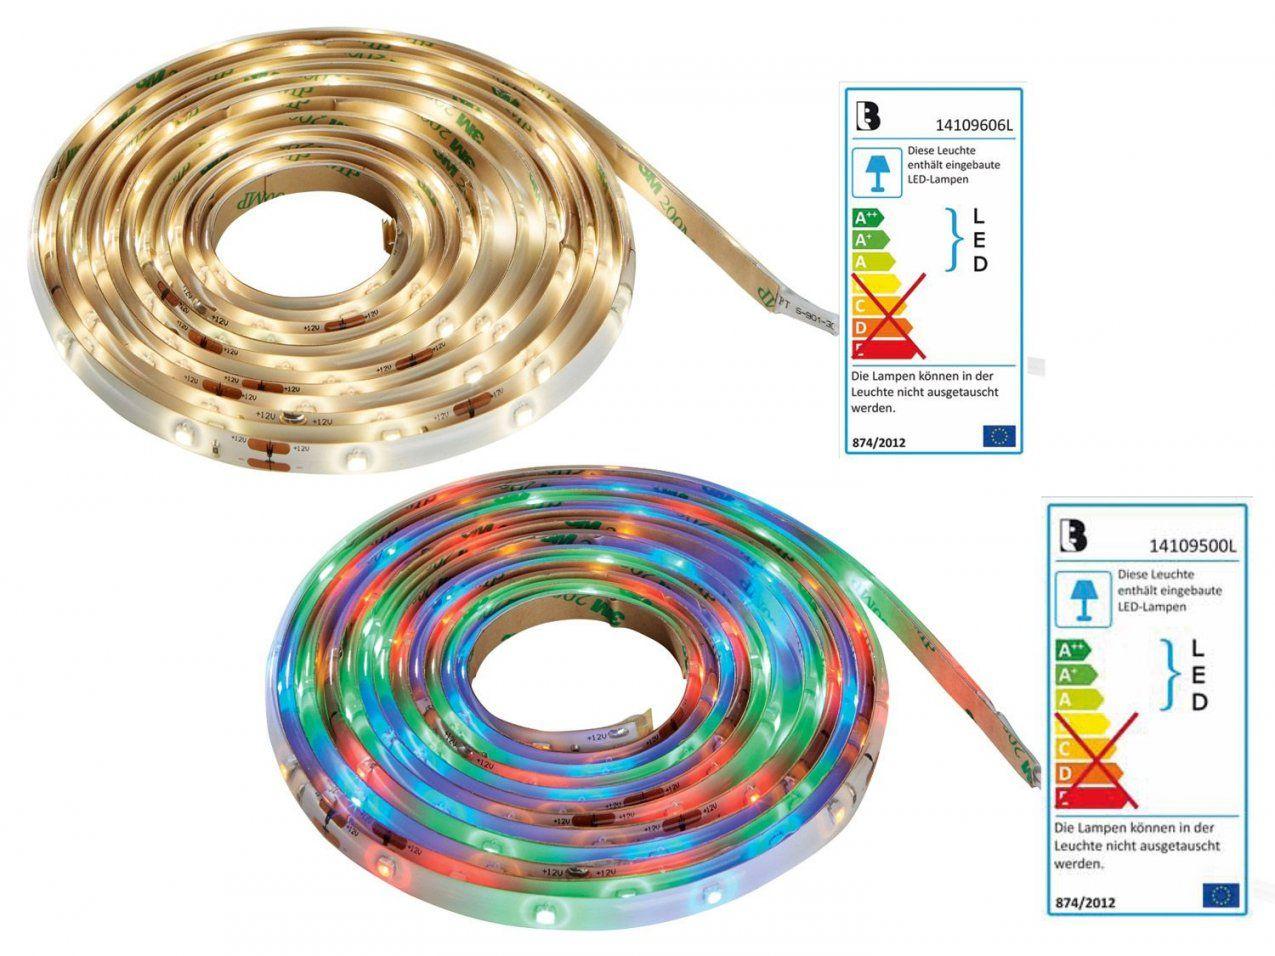 Livarno Lux® Ledband 3 M  Lidl Deutschland  Lidl von Livarno Lux Led Band Bild